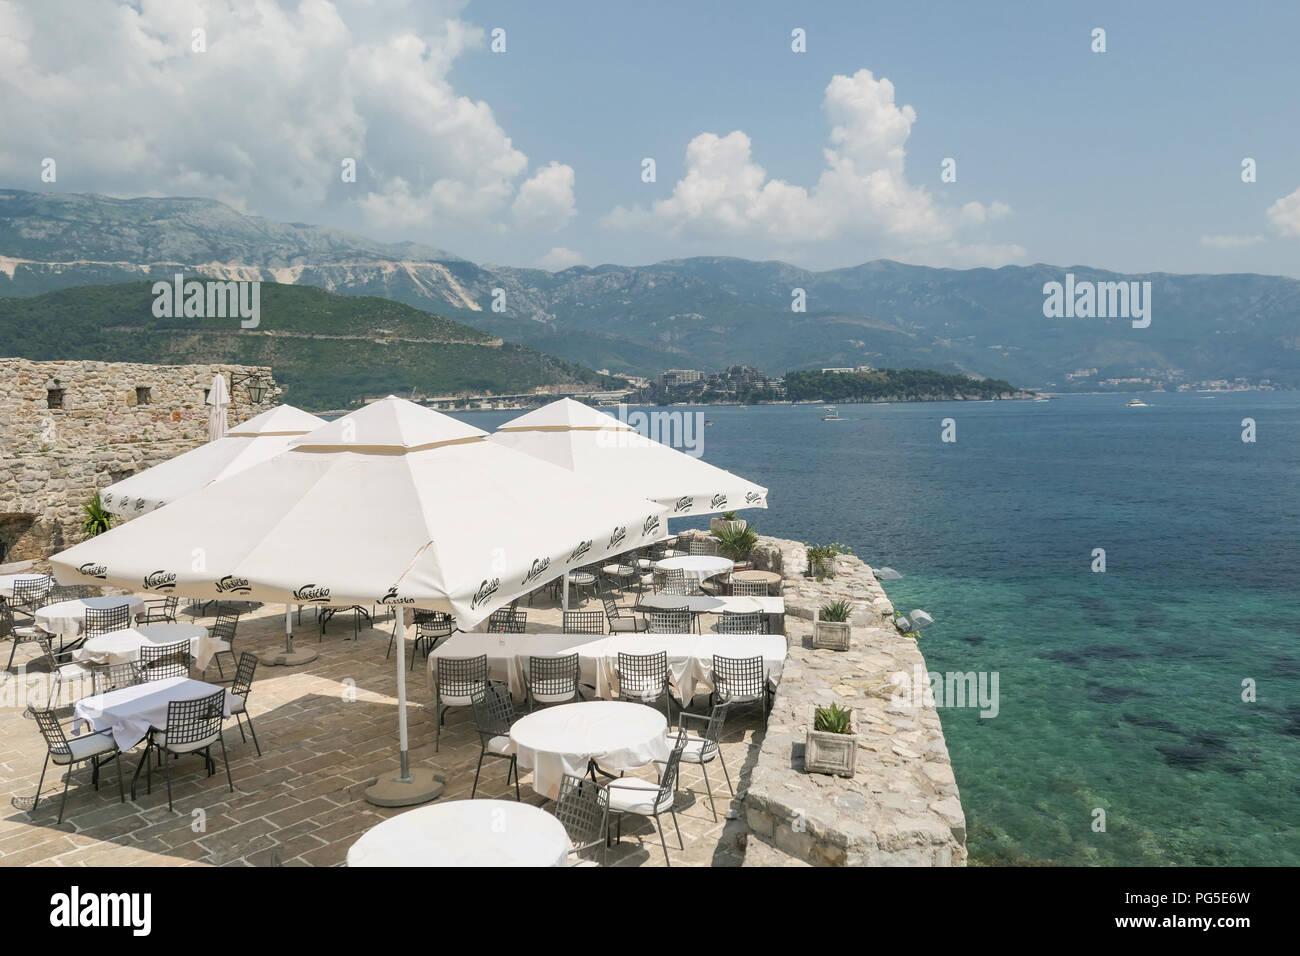 Citadela restaurant overlooking the Adriatic Sea, Budva Citadel, Budva, Montenegro, Europe - Stock Image